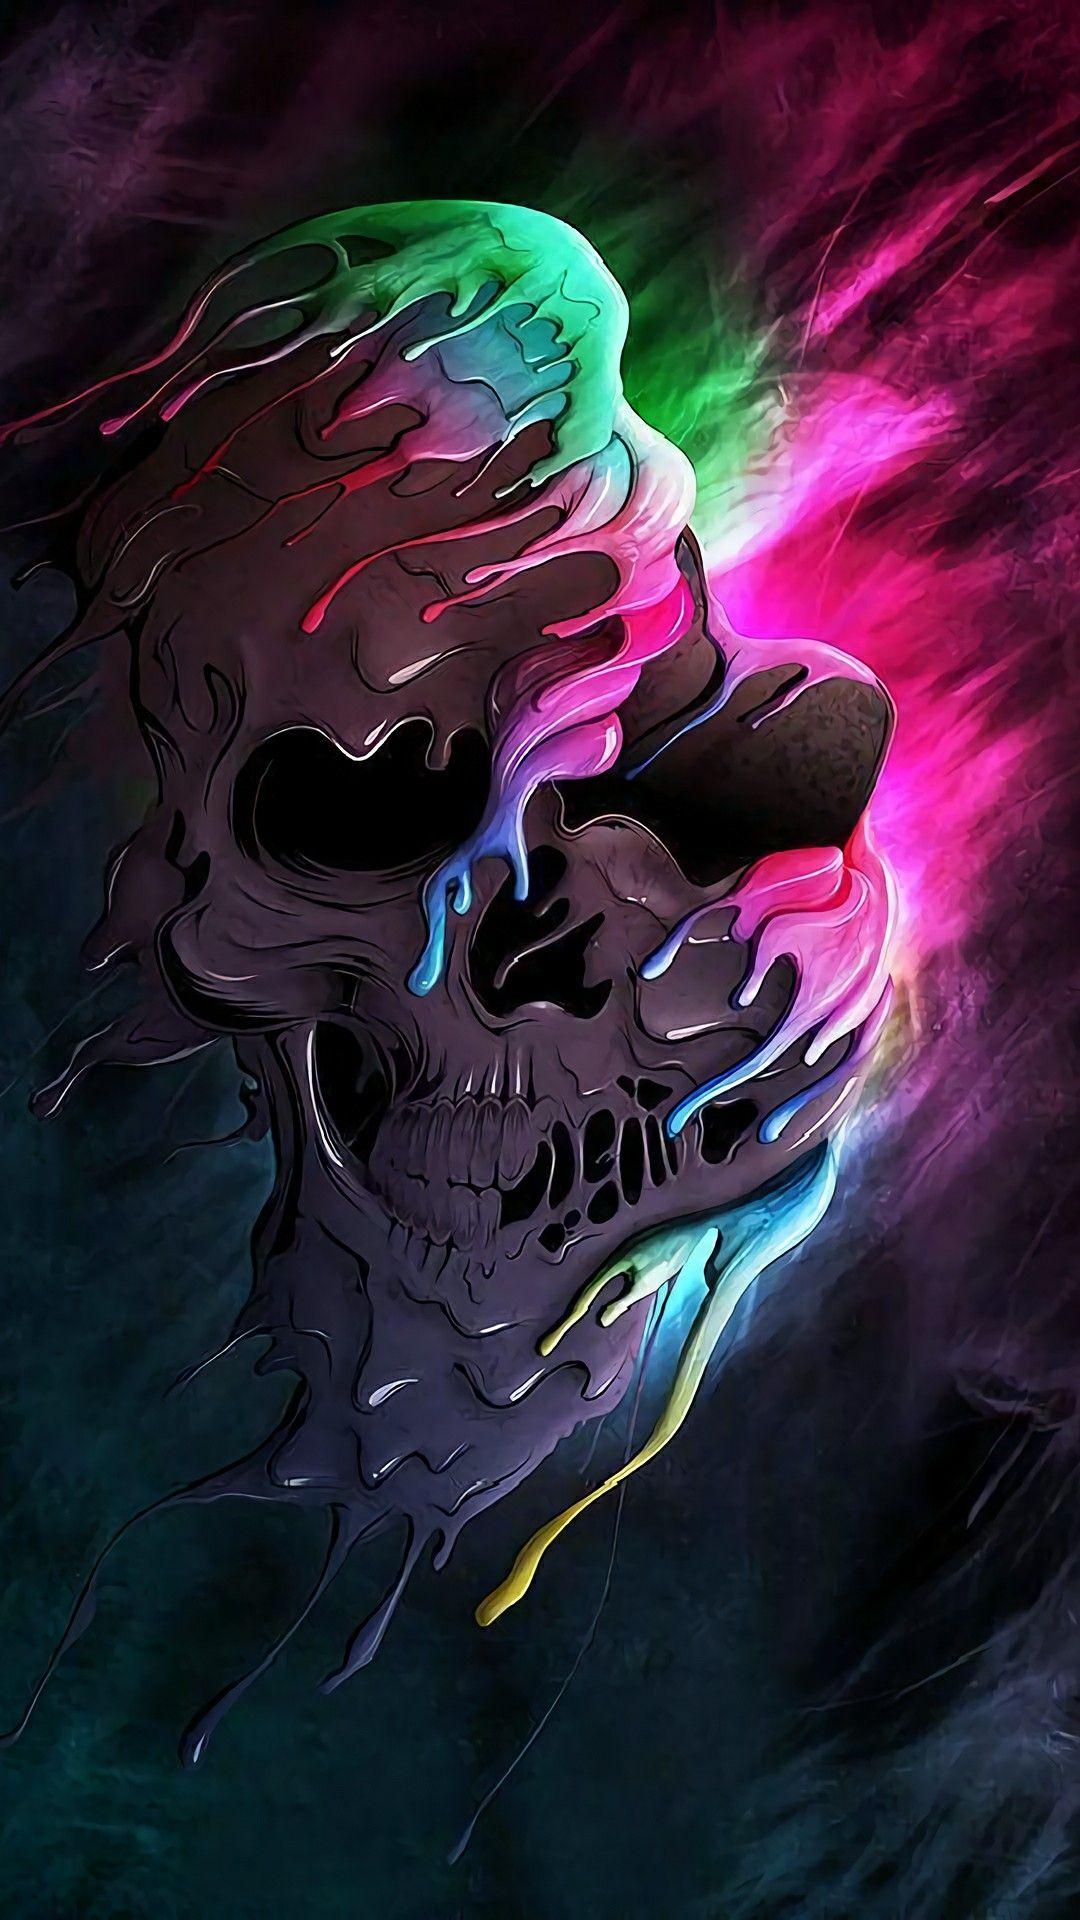 Colorful Skull Skull Wallpaper Skull Art Skull Pictures